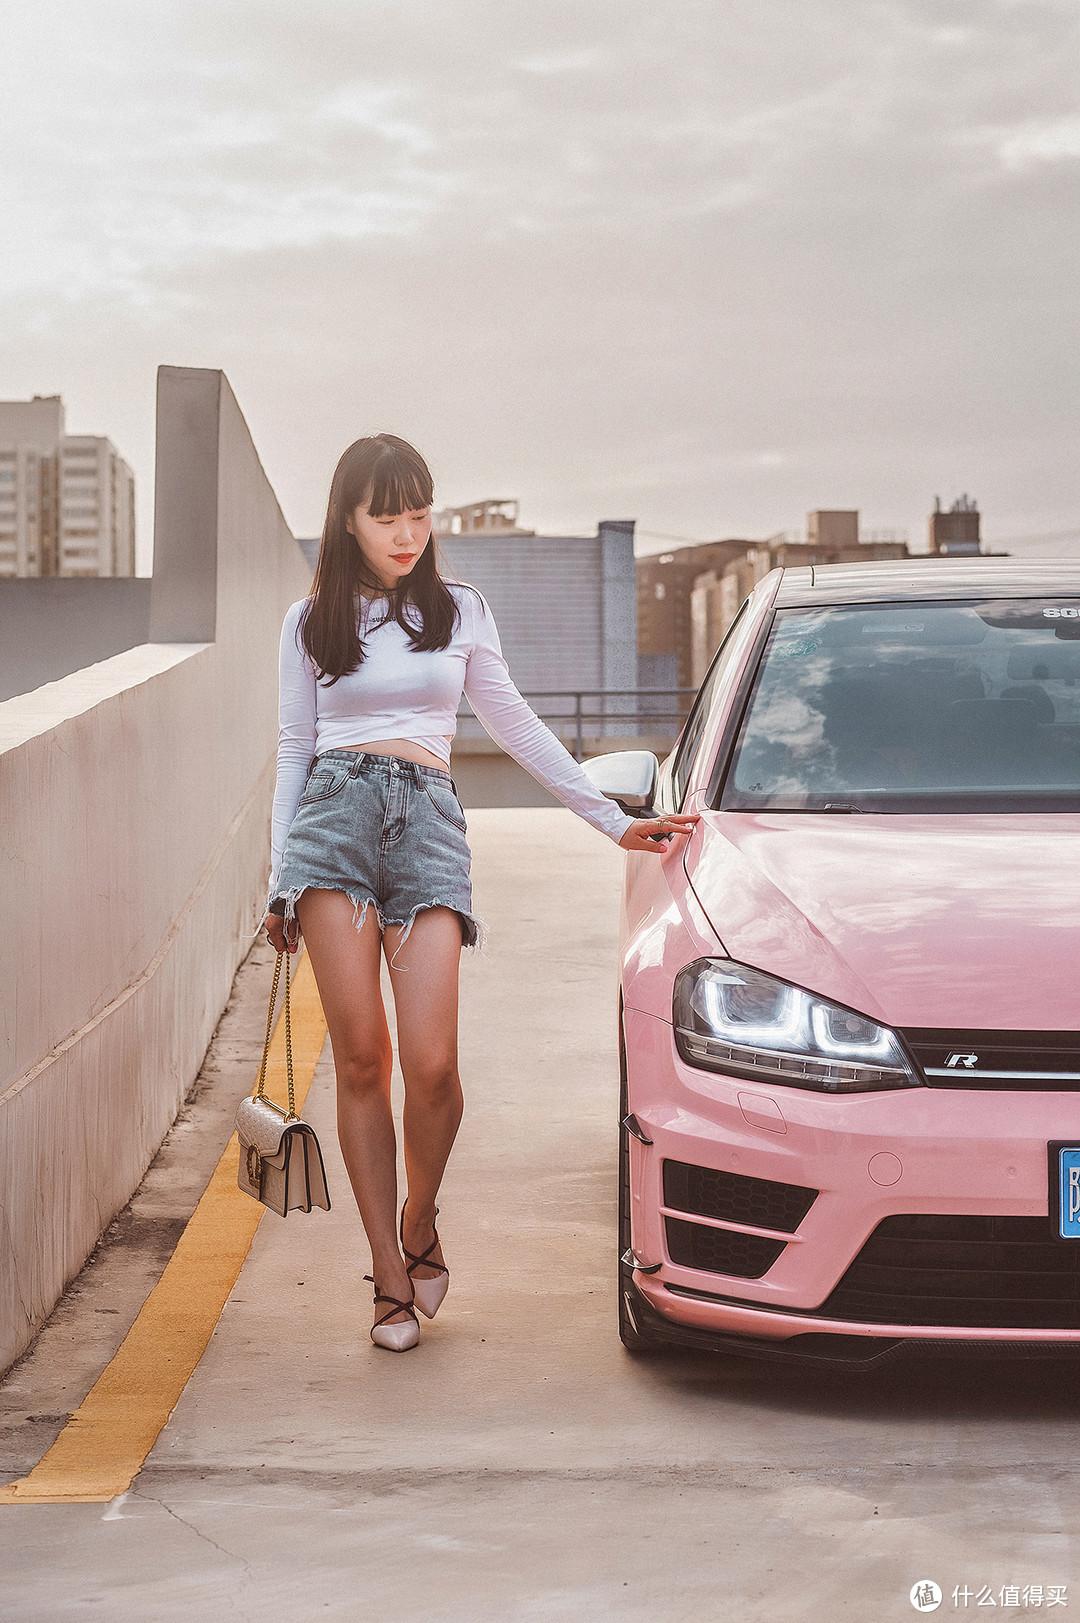 Get甜辣女孩拍车秘籍| 和爱车在停车场来一组时尚大片